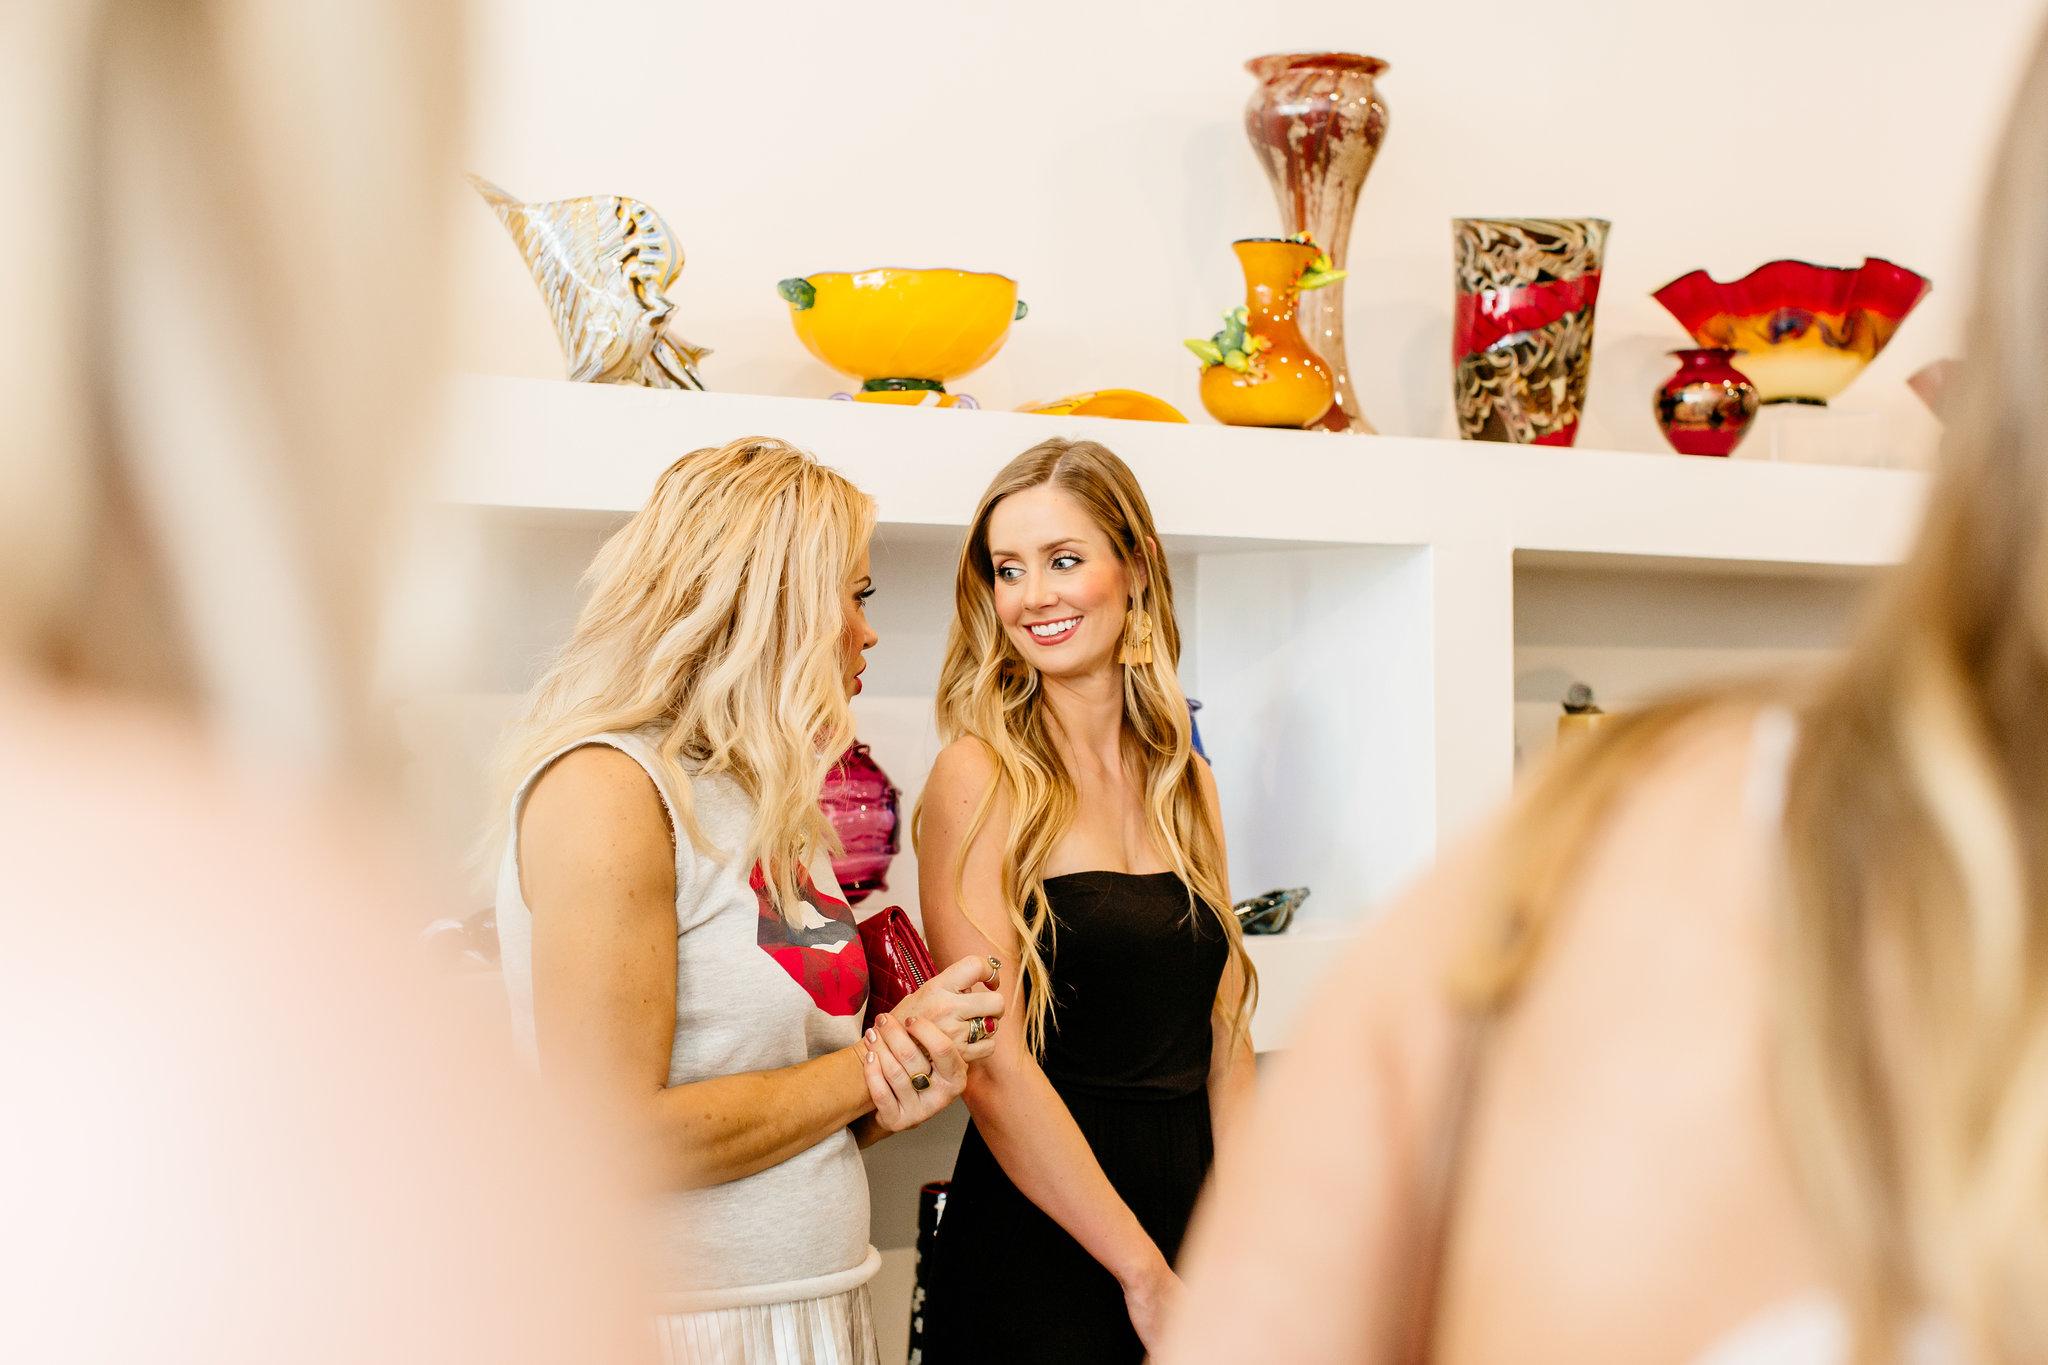 Alexa-Vossler-Photo_Dallas-Event-Photographer_Brite-Bar-Beauty-2018-Lipstick-Launch-Party-104.jpg